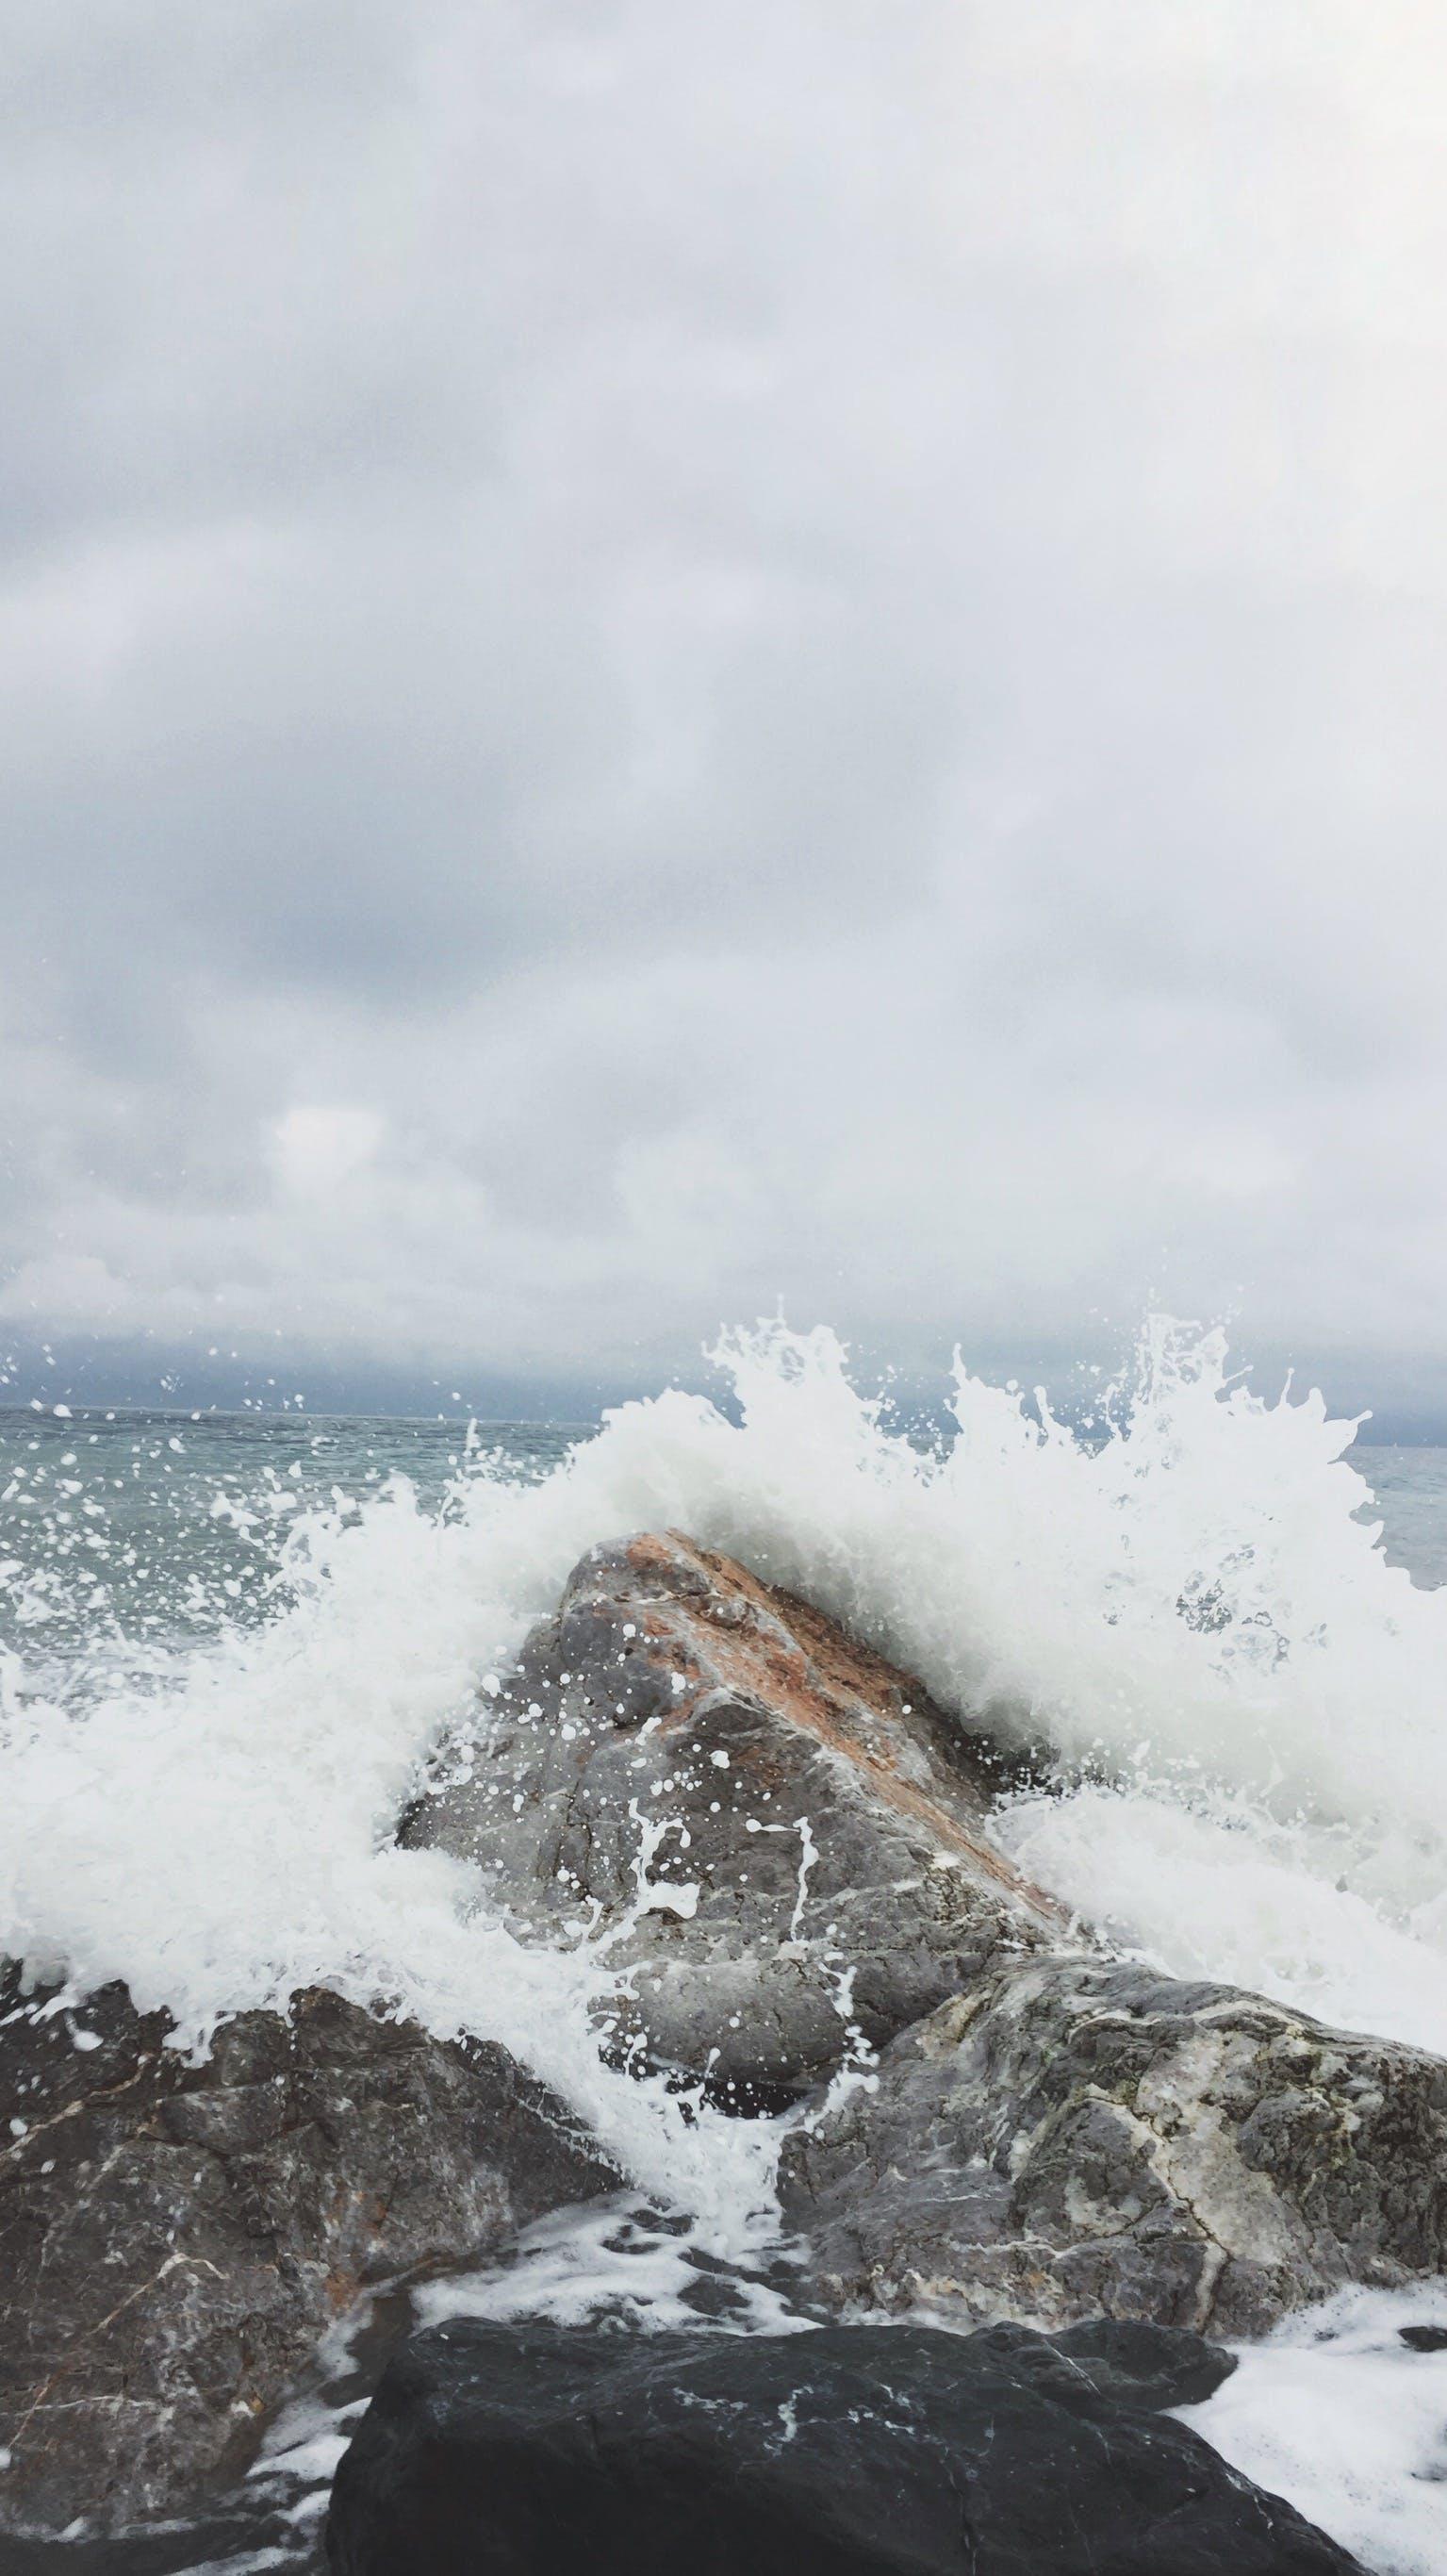 берег моря, вода, гора